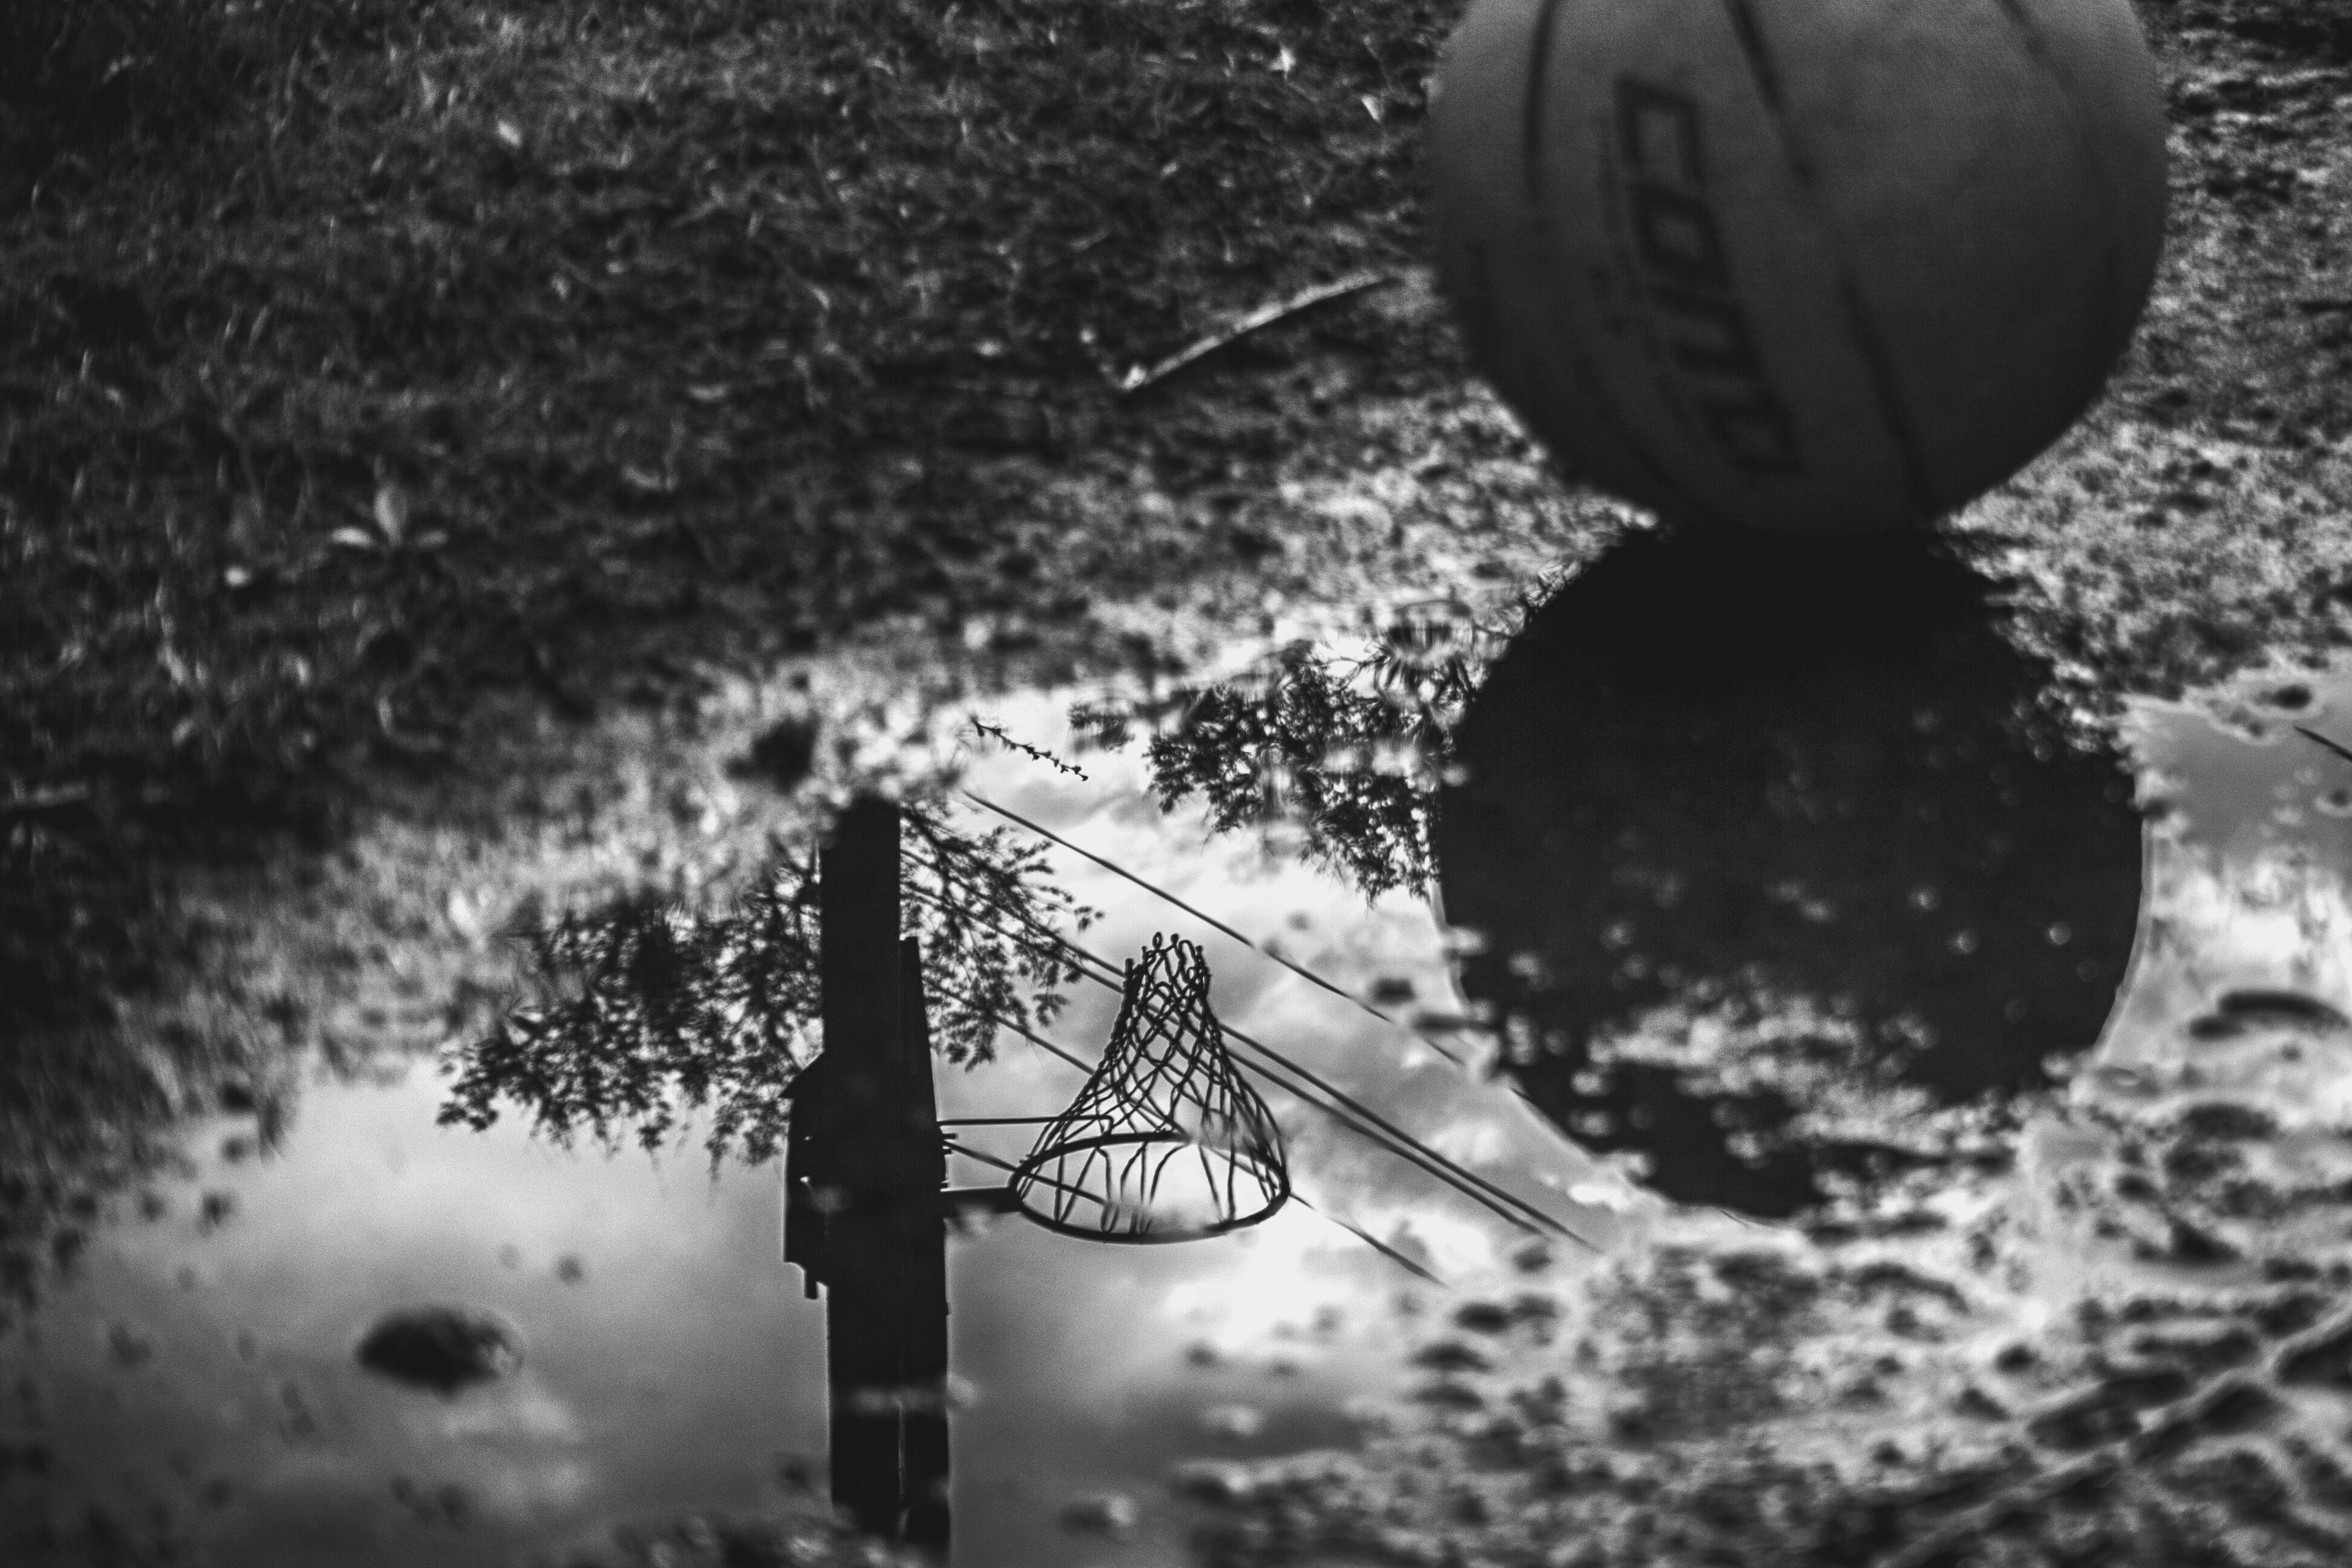 Baloncesto en gris